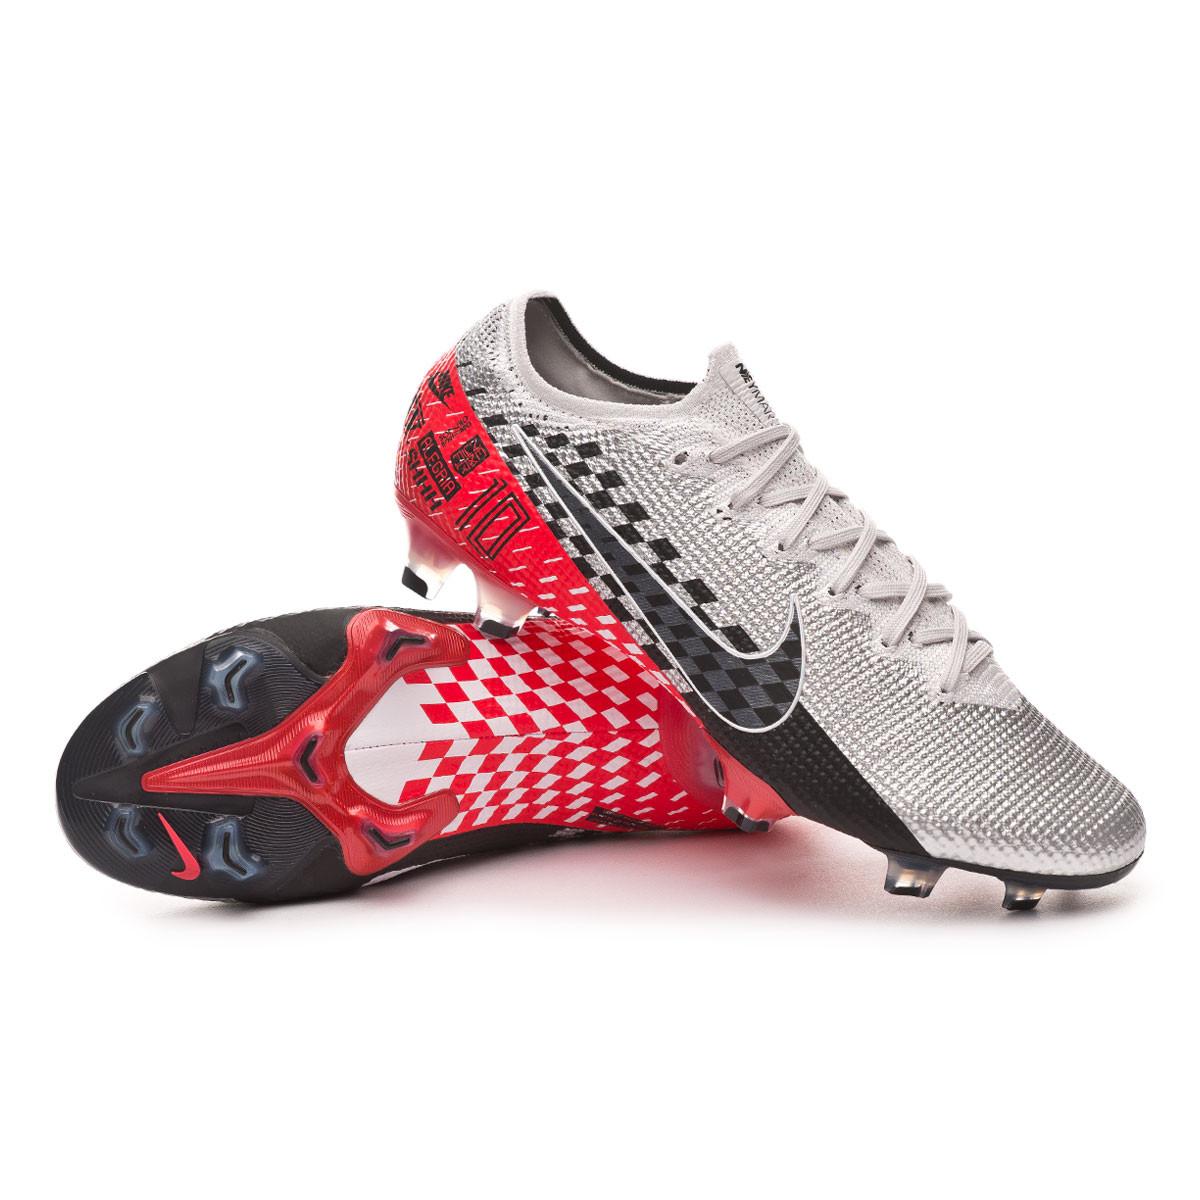 Scarpe Nike Mercurial Vapor XIII Elite FG Neymar Jr Chrome  aYYhVT